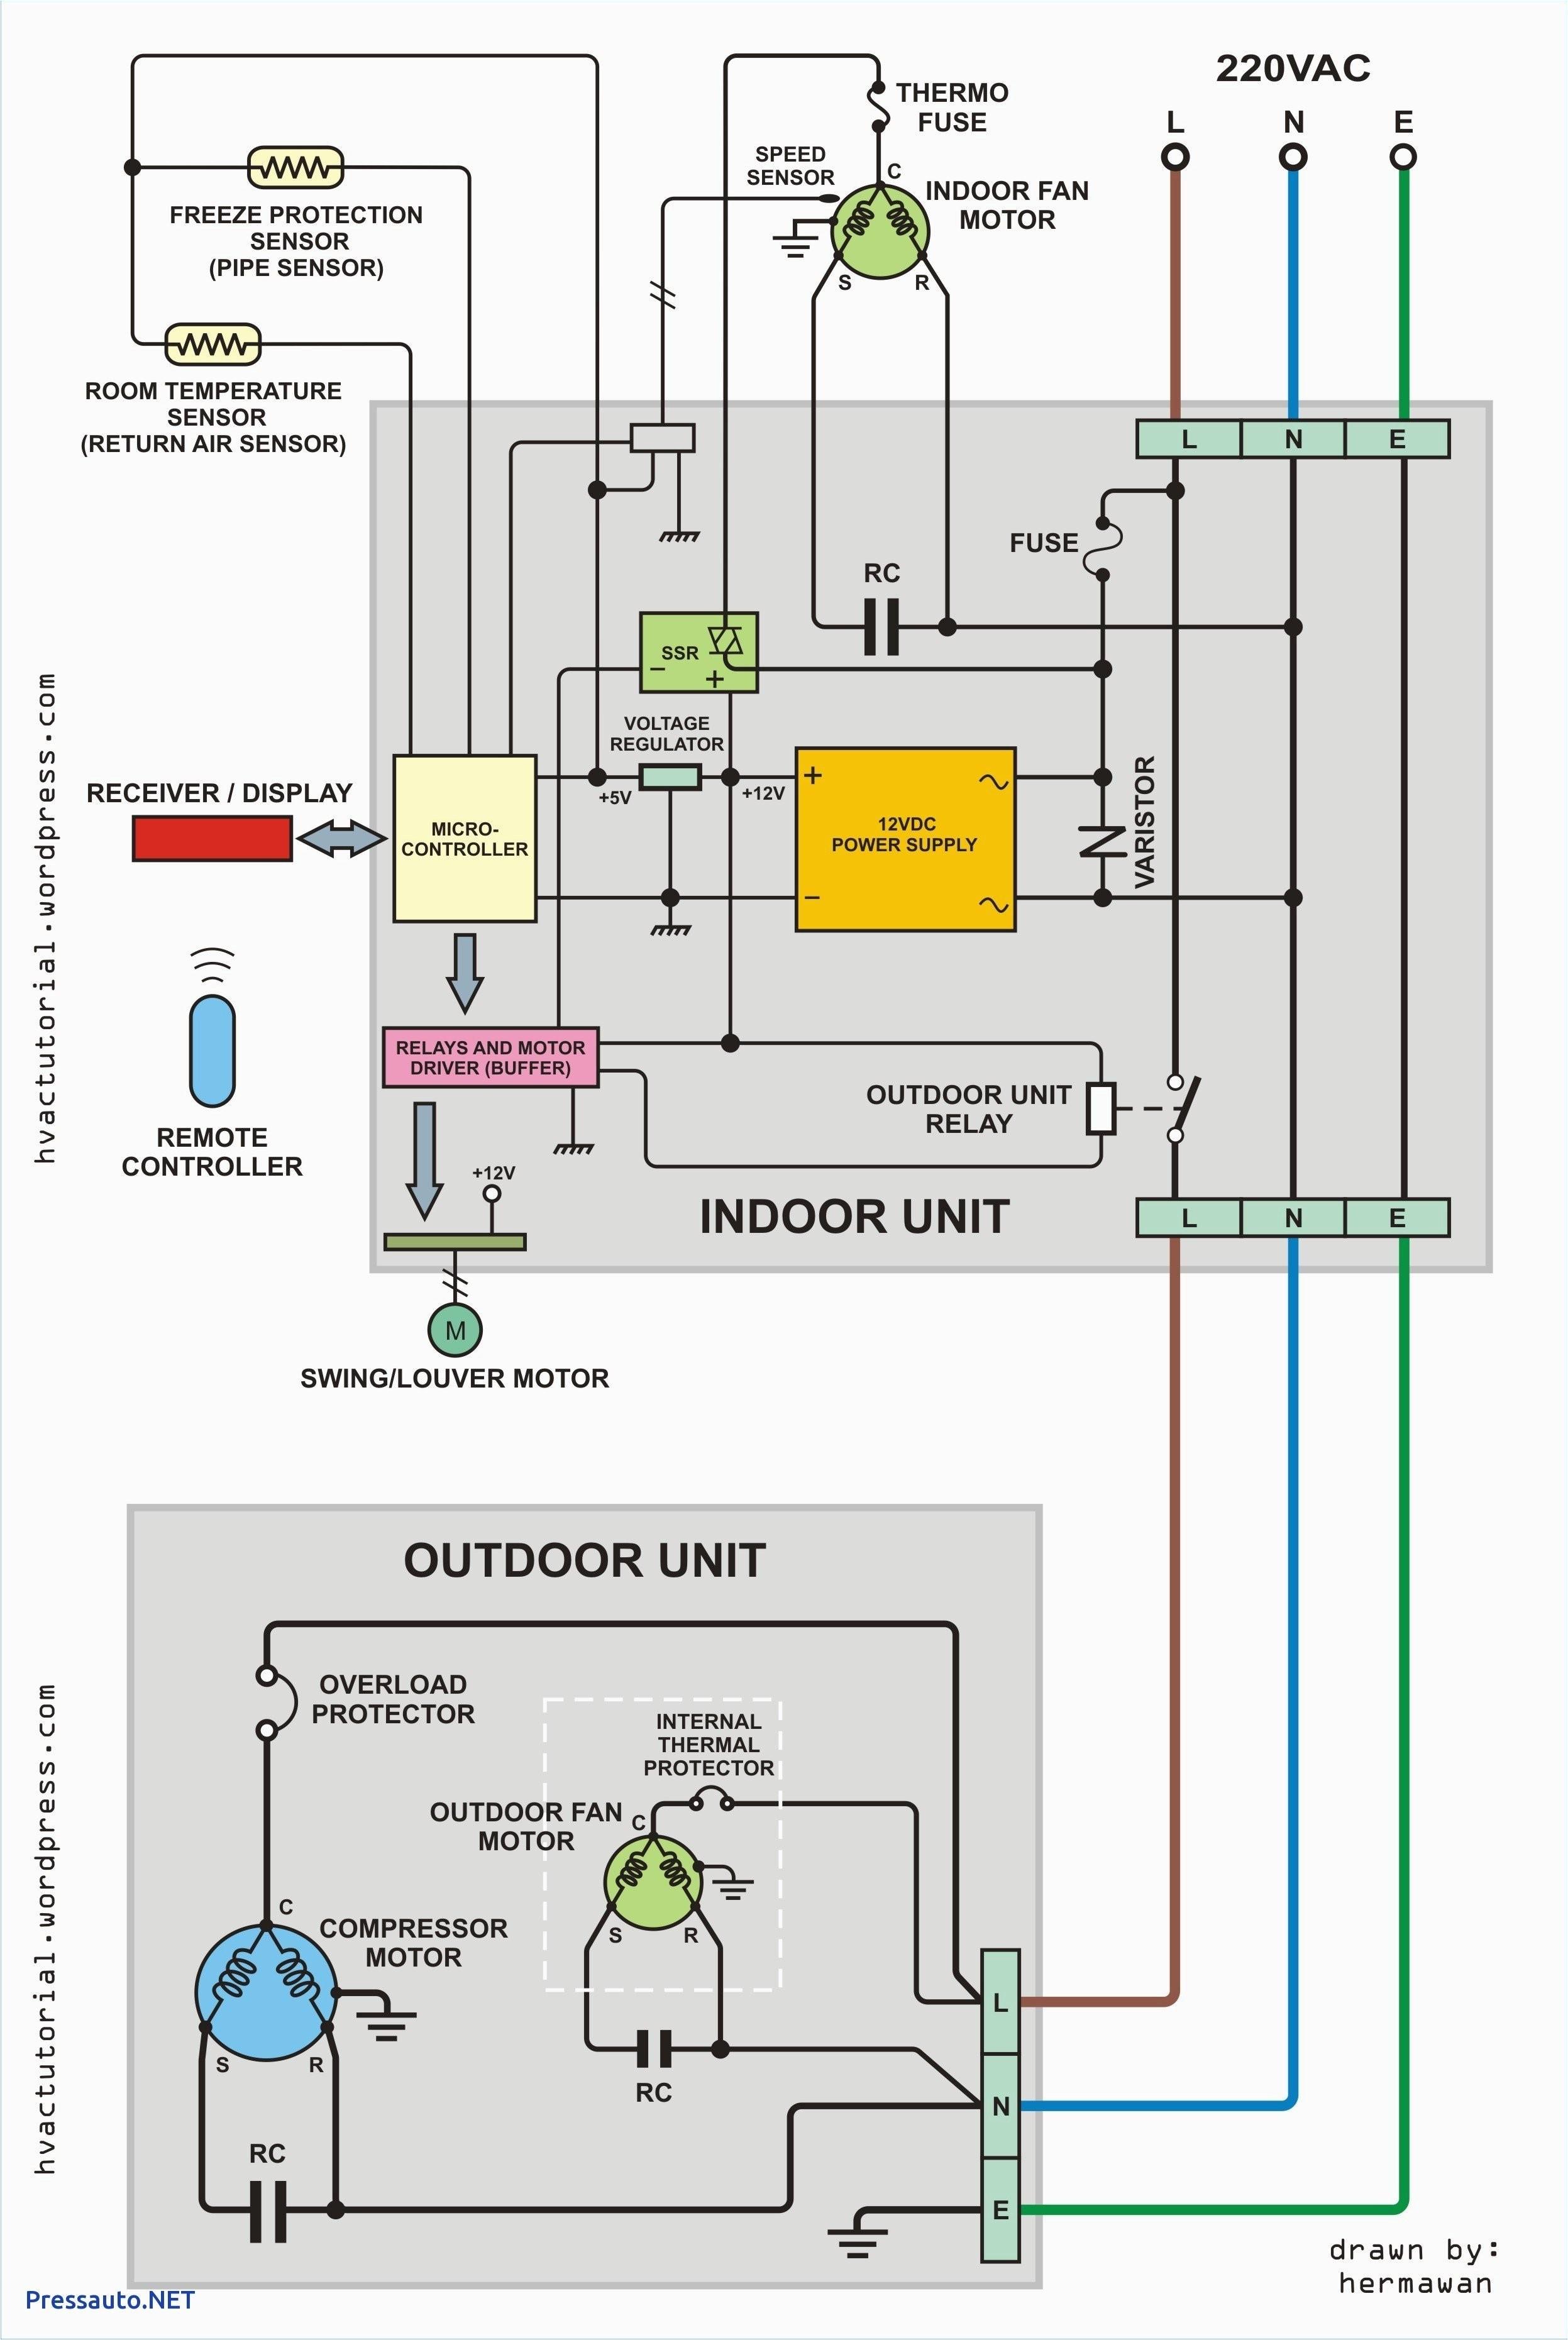 wiring diagram 3 phase motor free ac wiring diagram features 6224d1163433558anyonehavebetterfusediagramfuserelay2jpg